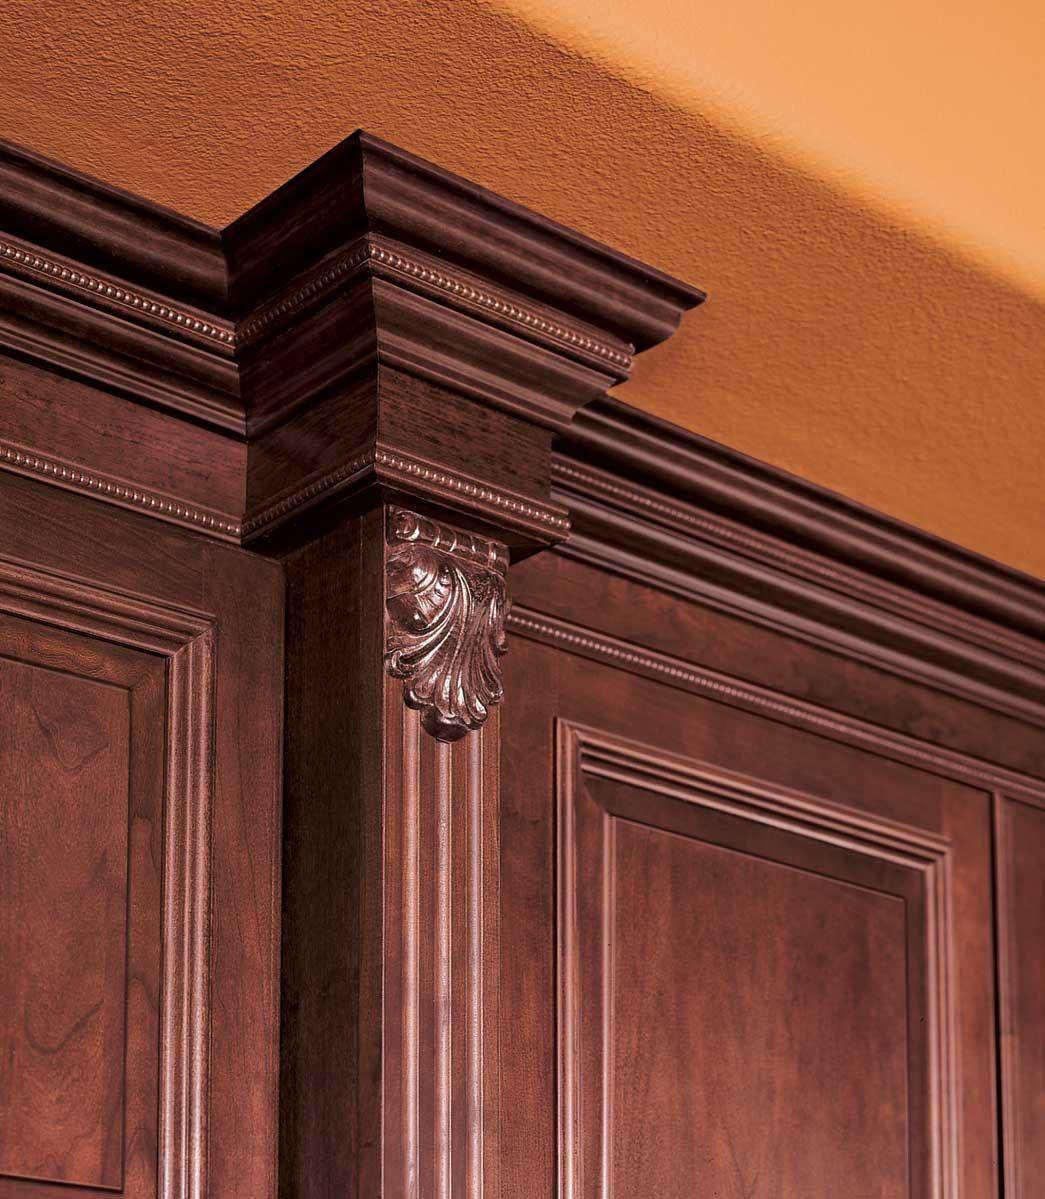 Cabinet Moldings & Decorative Accents